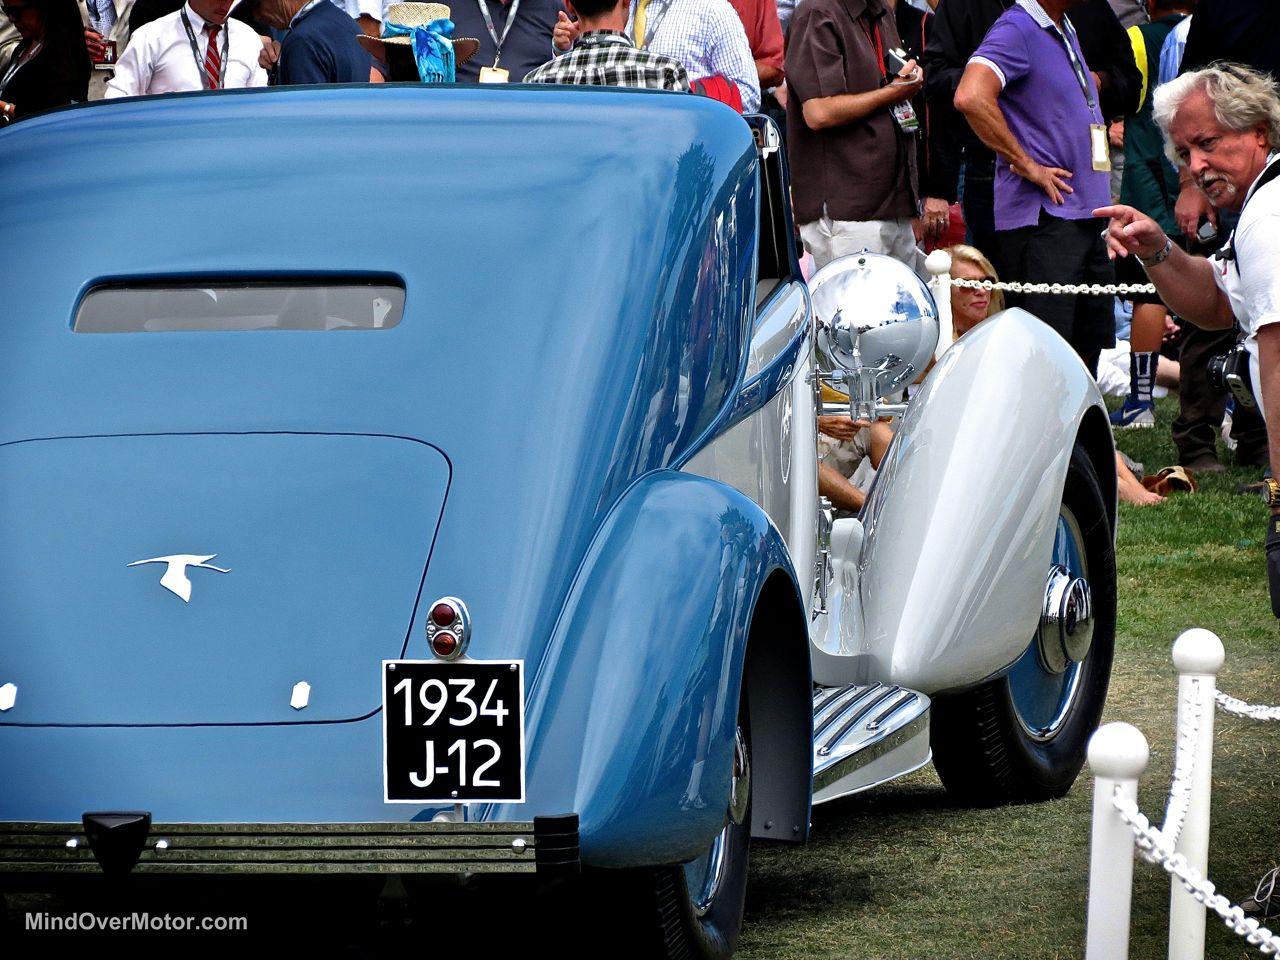 Pebble Beach 2014-1934 Hispano-Suiza Coupe Chauffeur